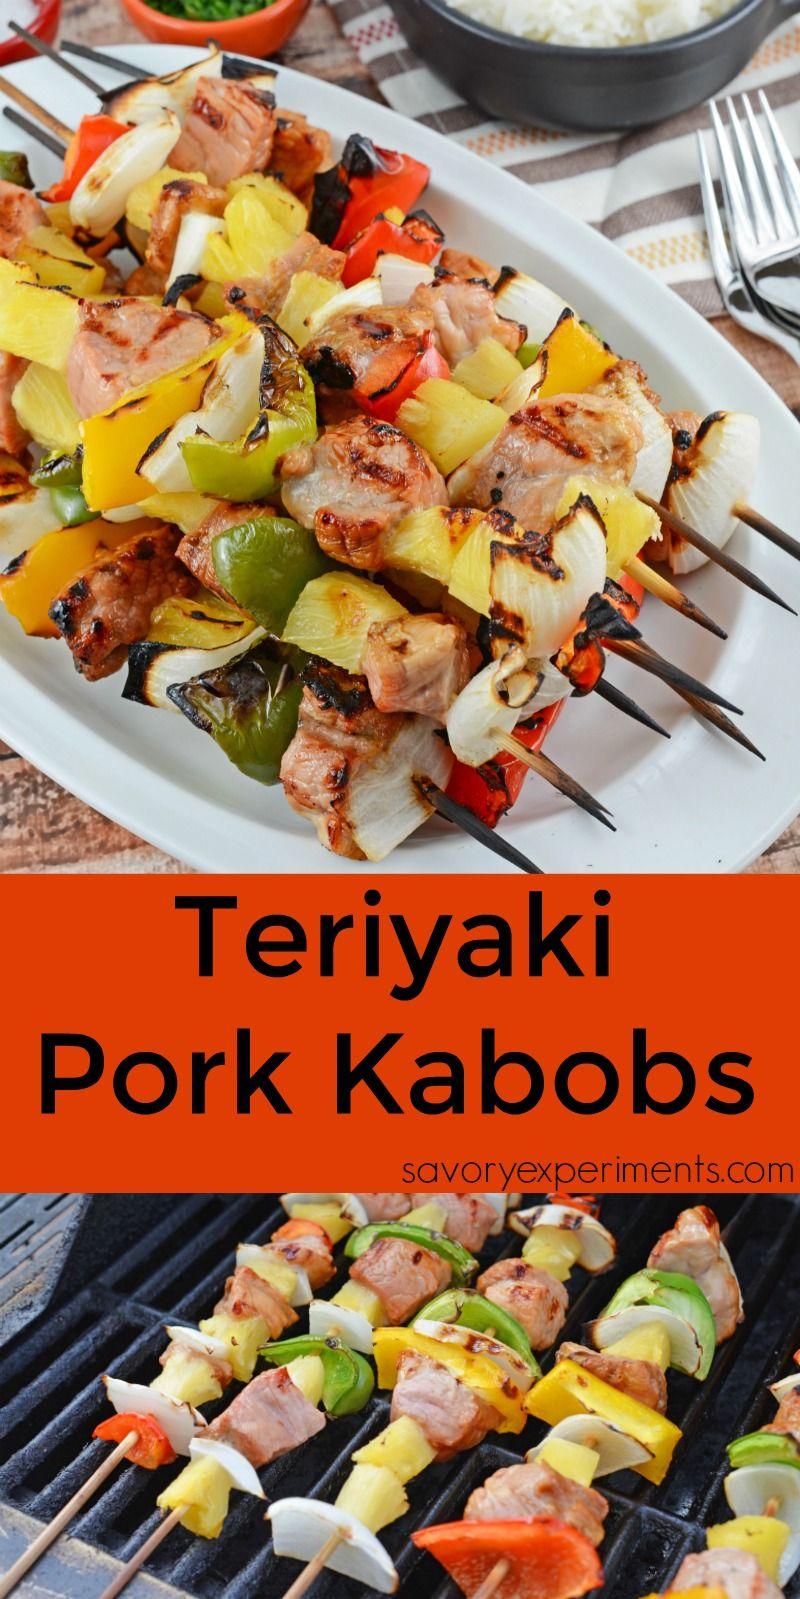 Teriyaki Pork Kabobs Recipe - Kabobs on the grill are a ...